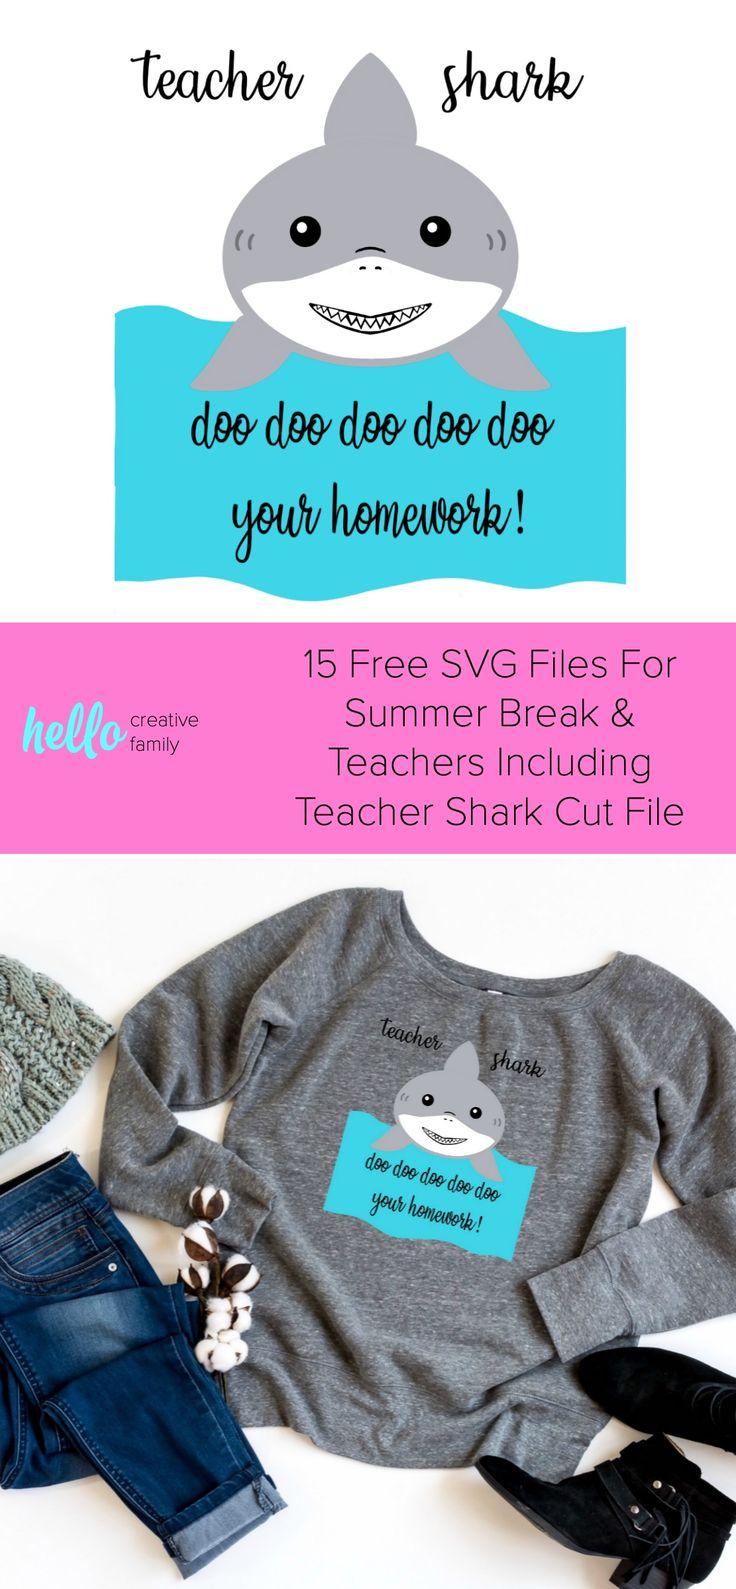 15 Free SVG Files For Summer Break & Teachers Including Teacher Shark Cut File. ...